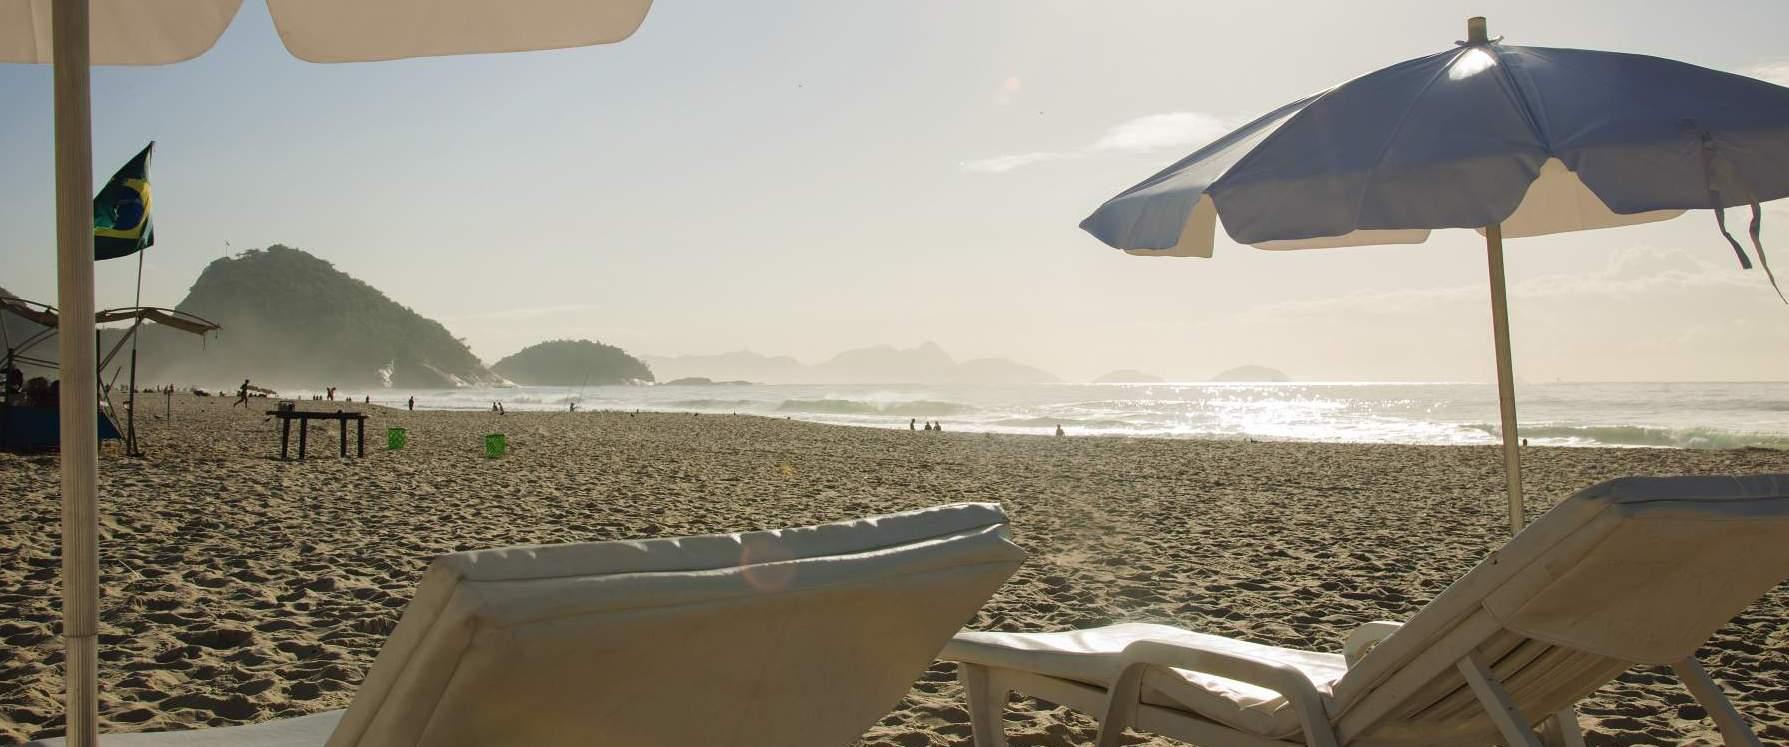 copacabana-beach-sun-loungers